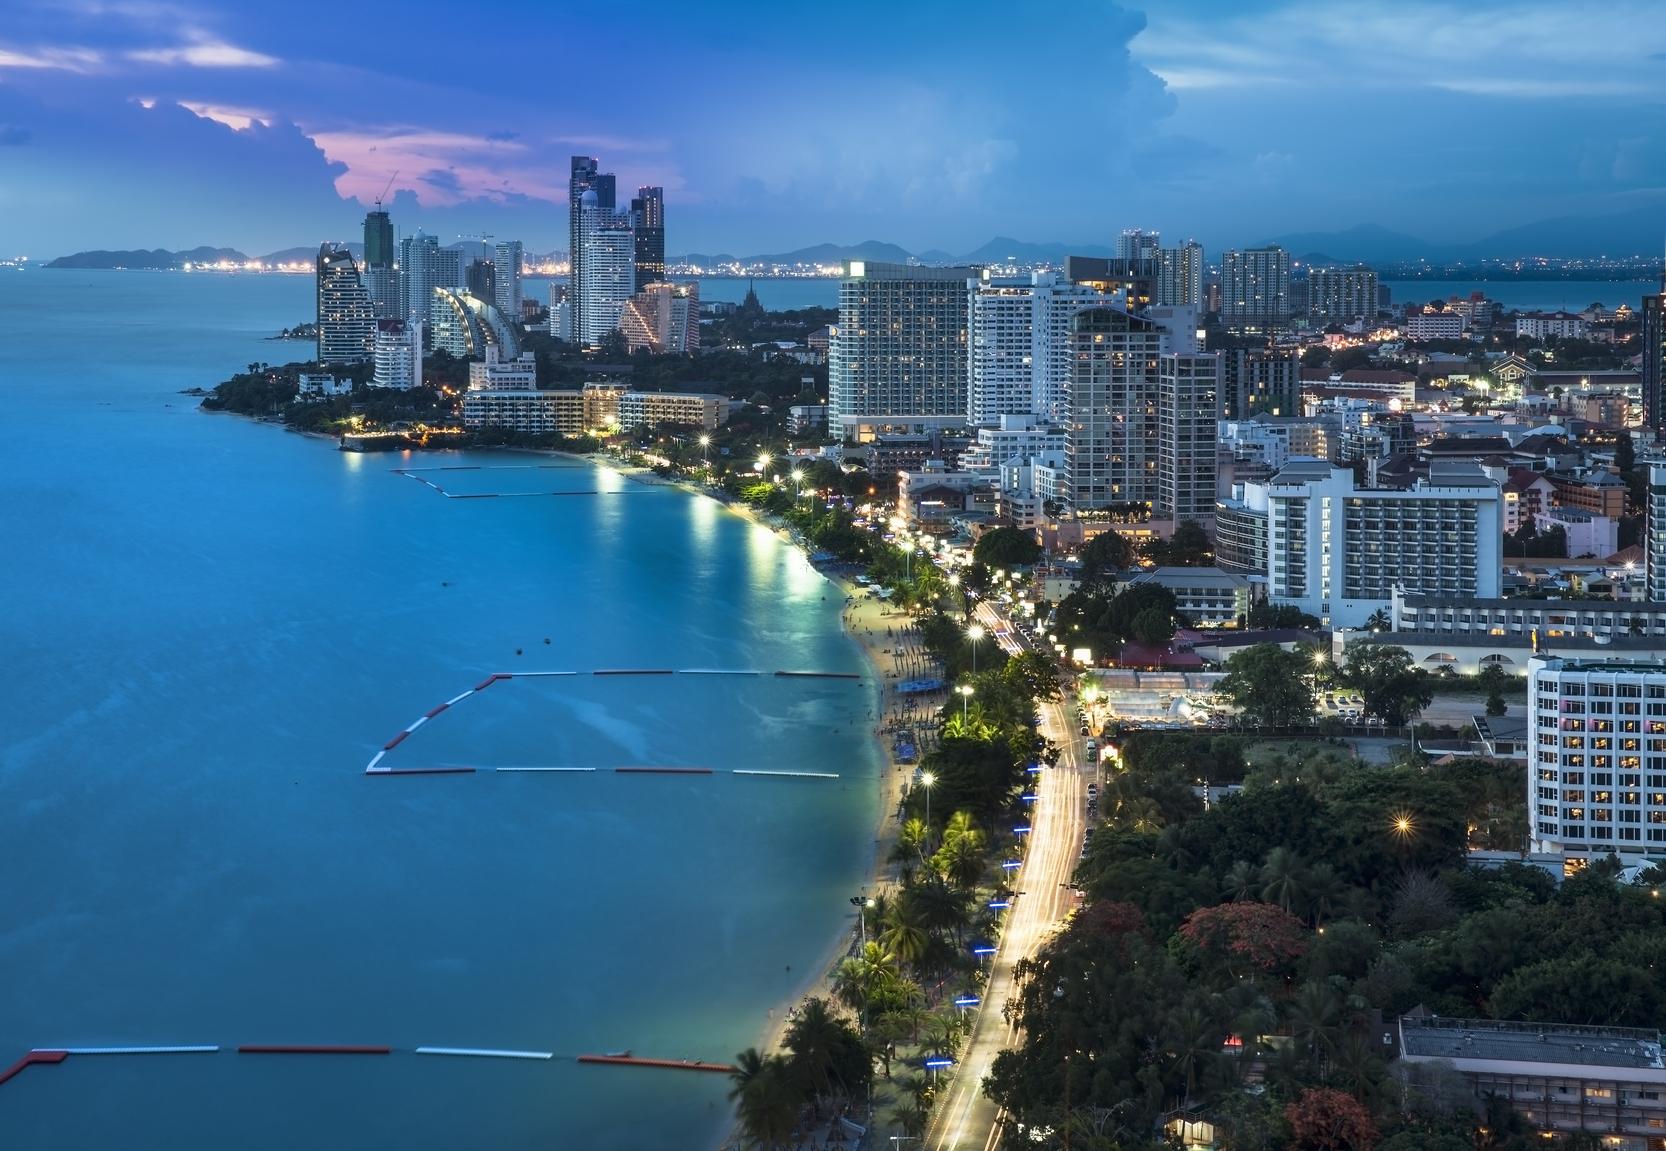 Budget Vacation Ideas in Thailand Pattaya - Suma - Explore Asia